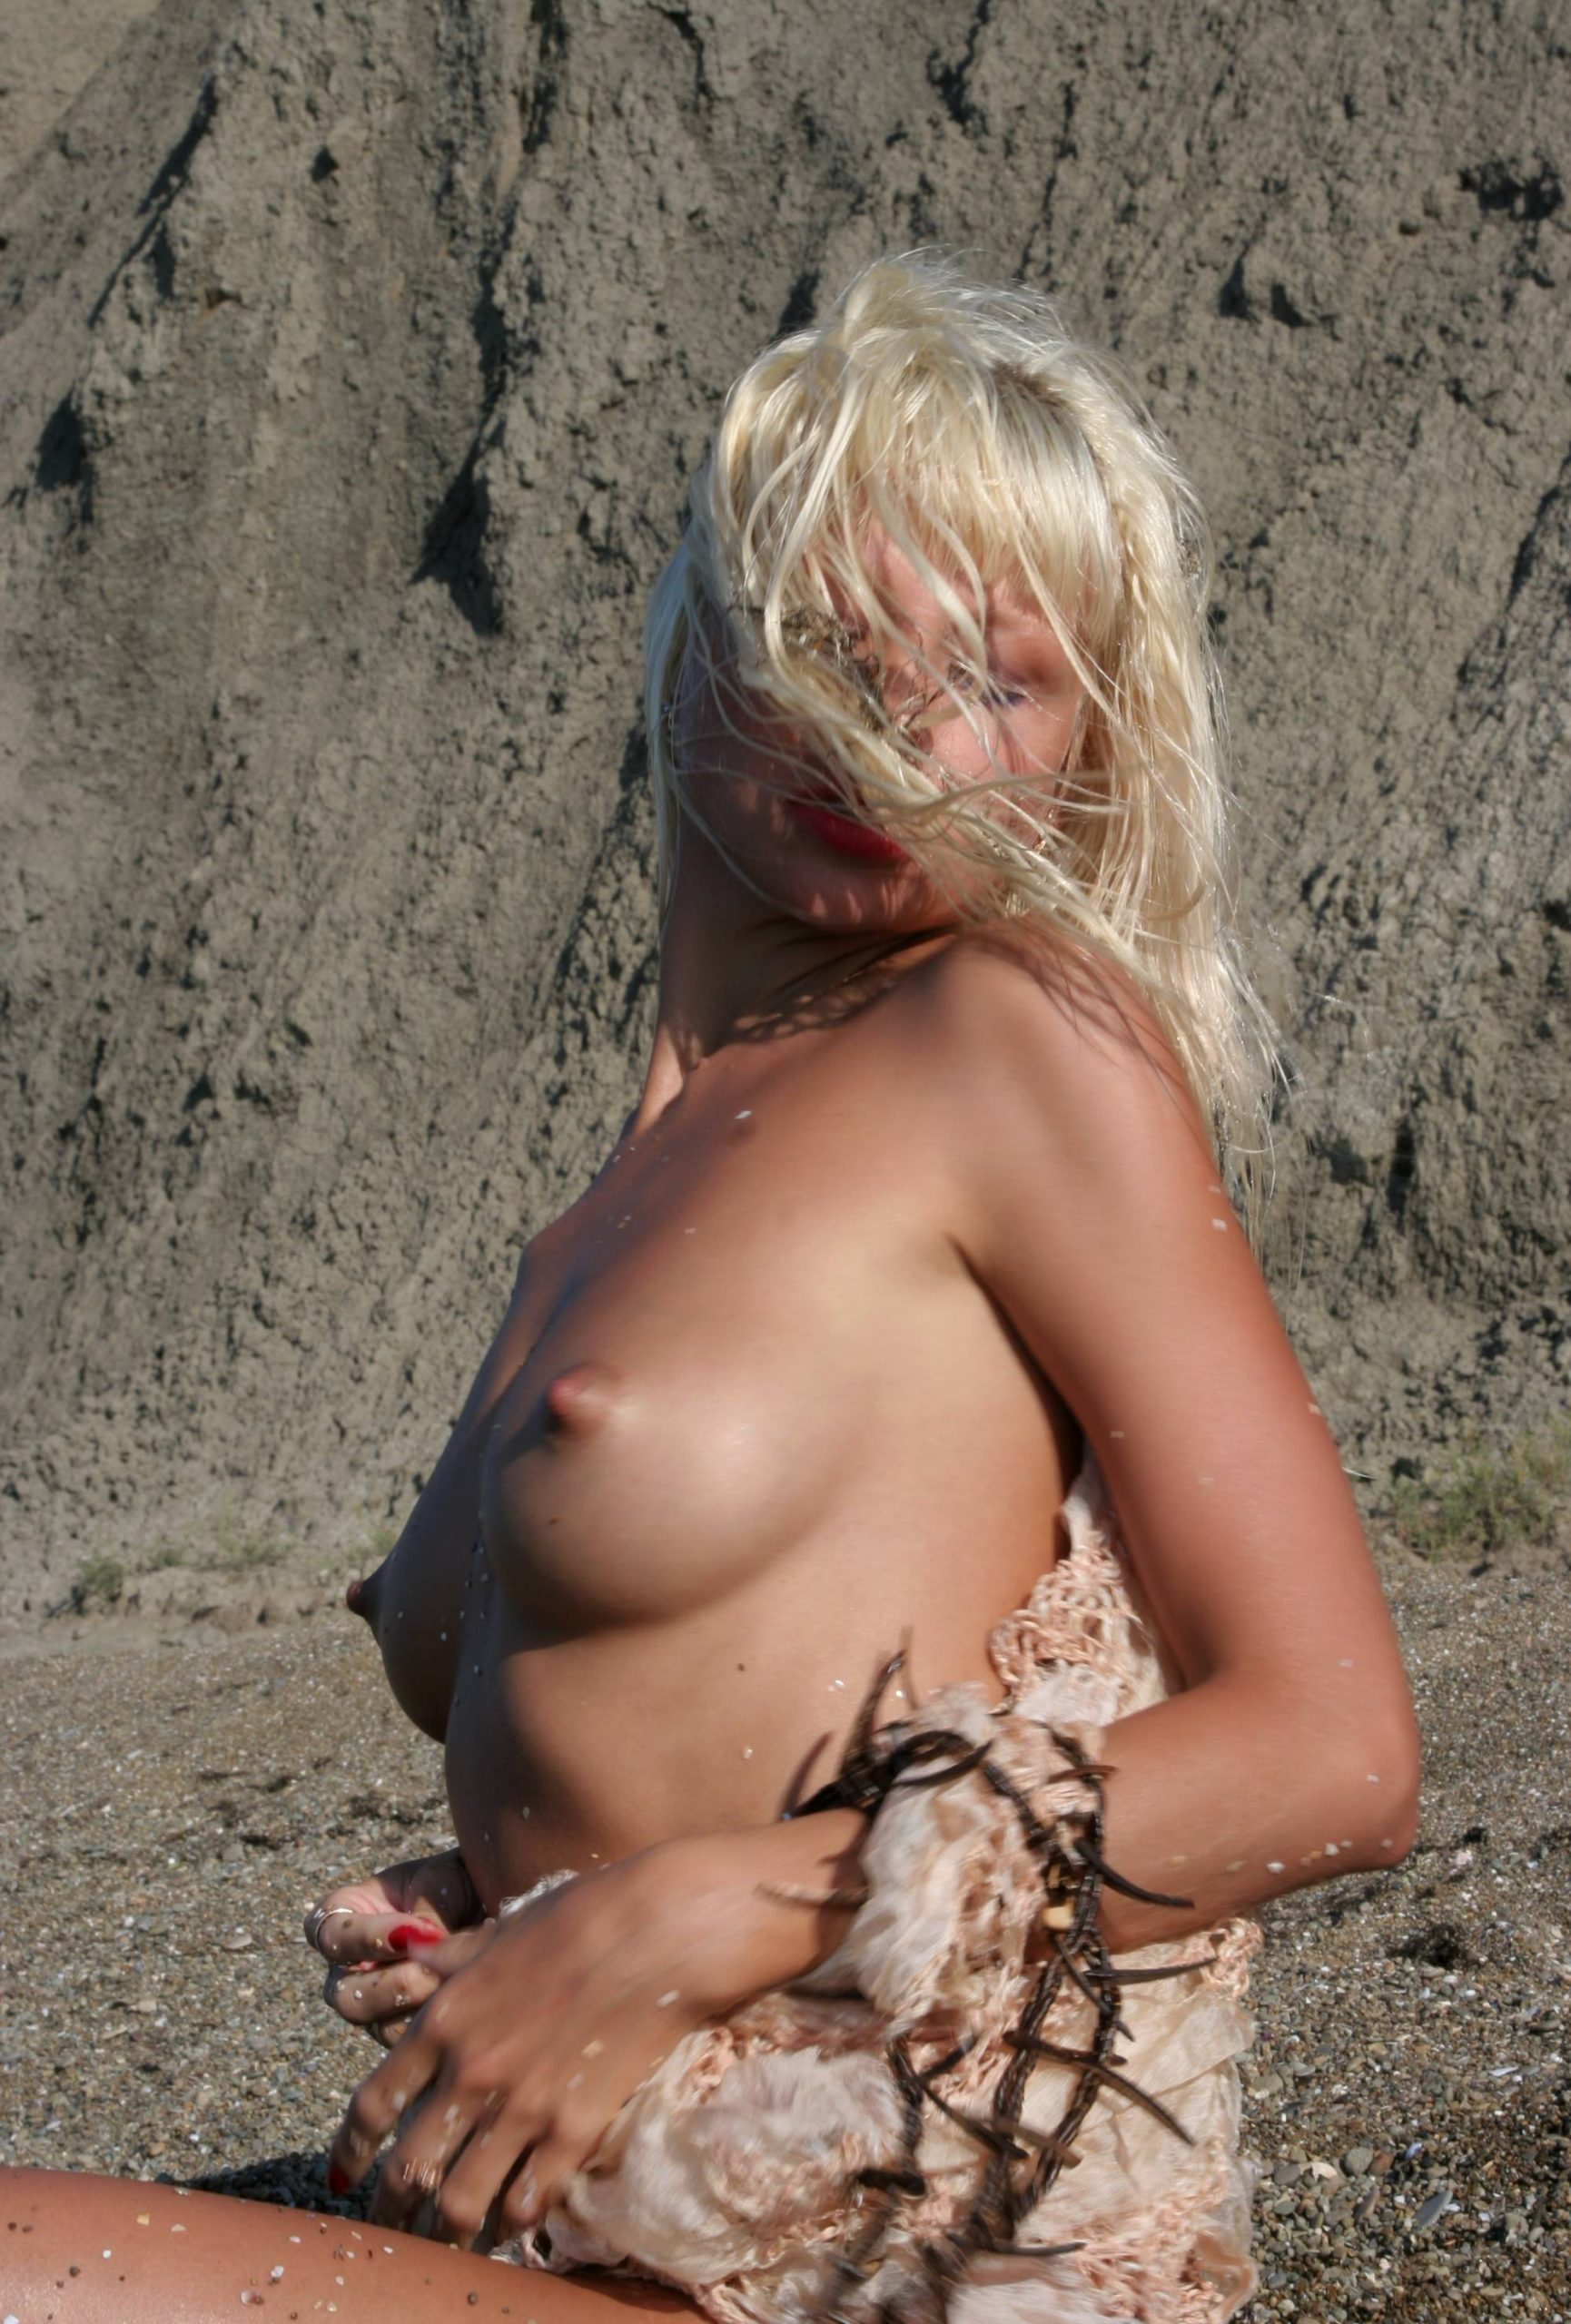 Purenudism Gallery-Blonde Nude on the Beach - 1